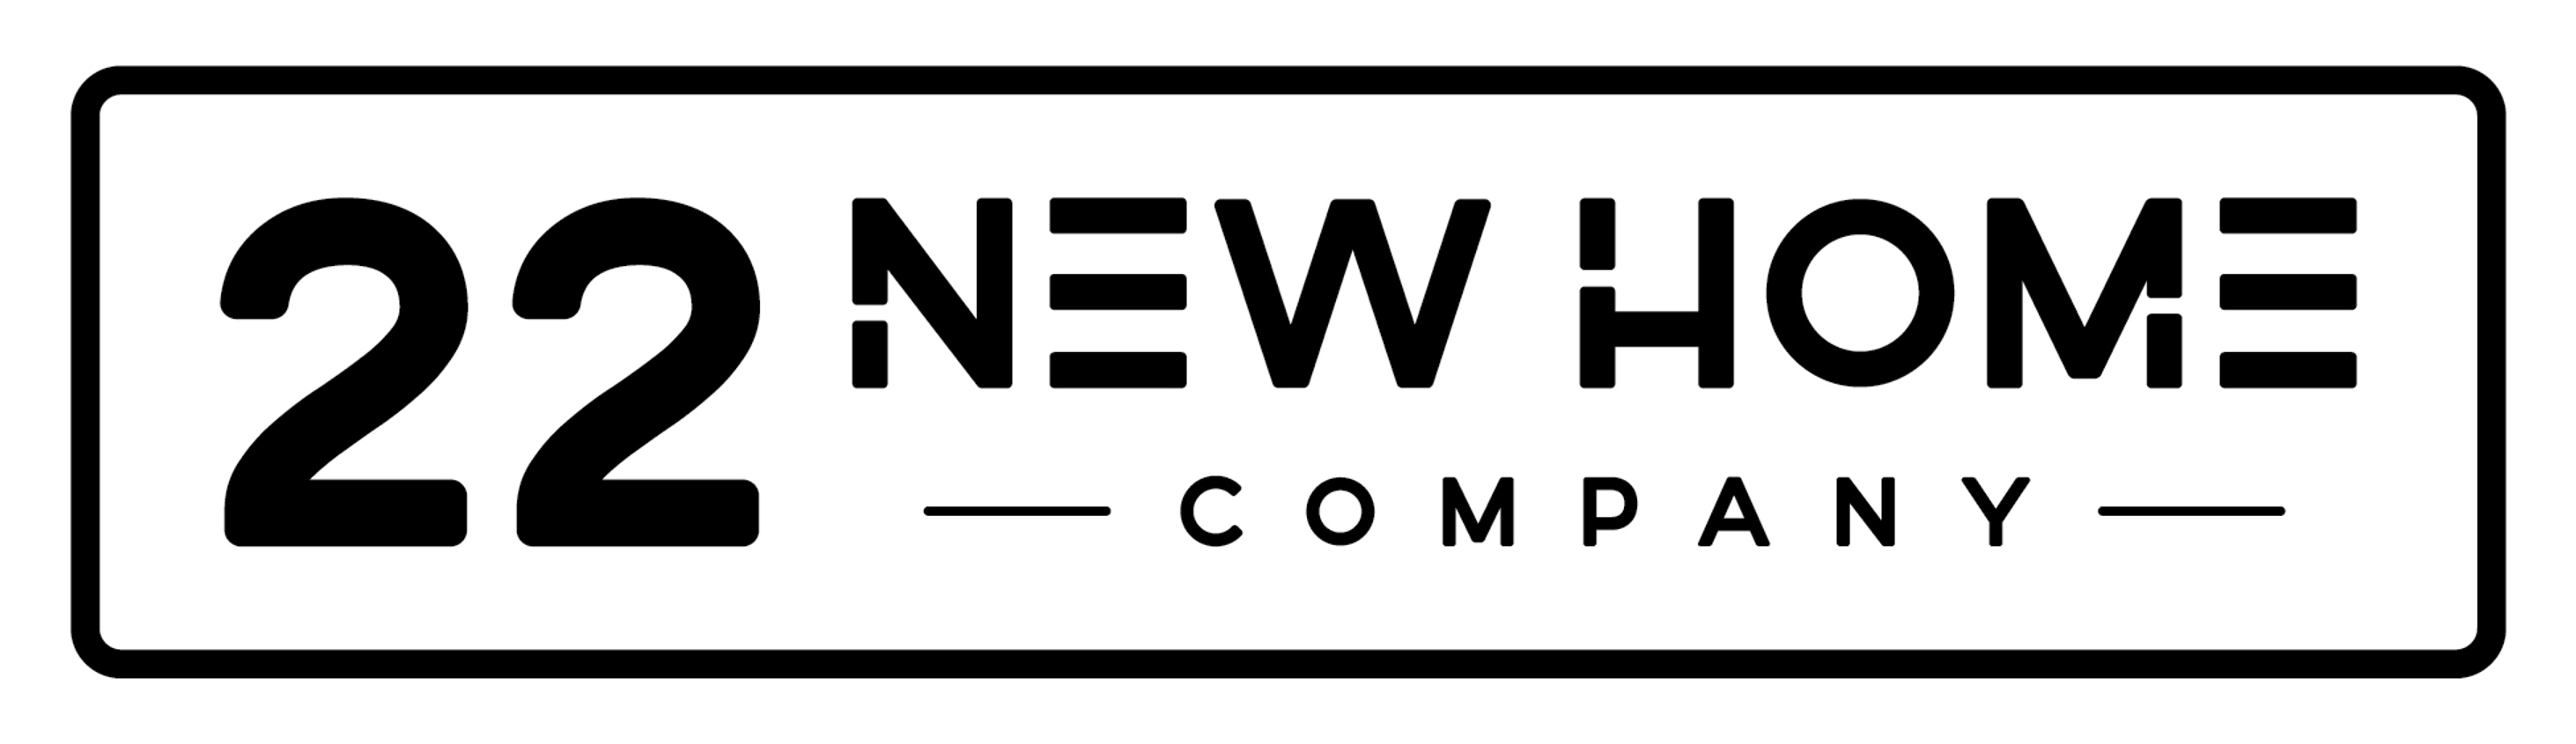 22 New Home Company